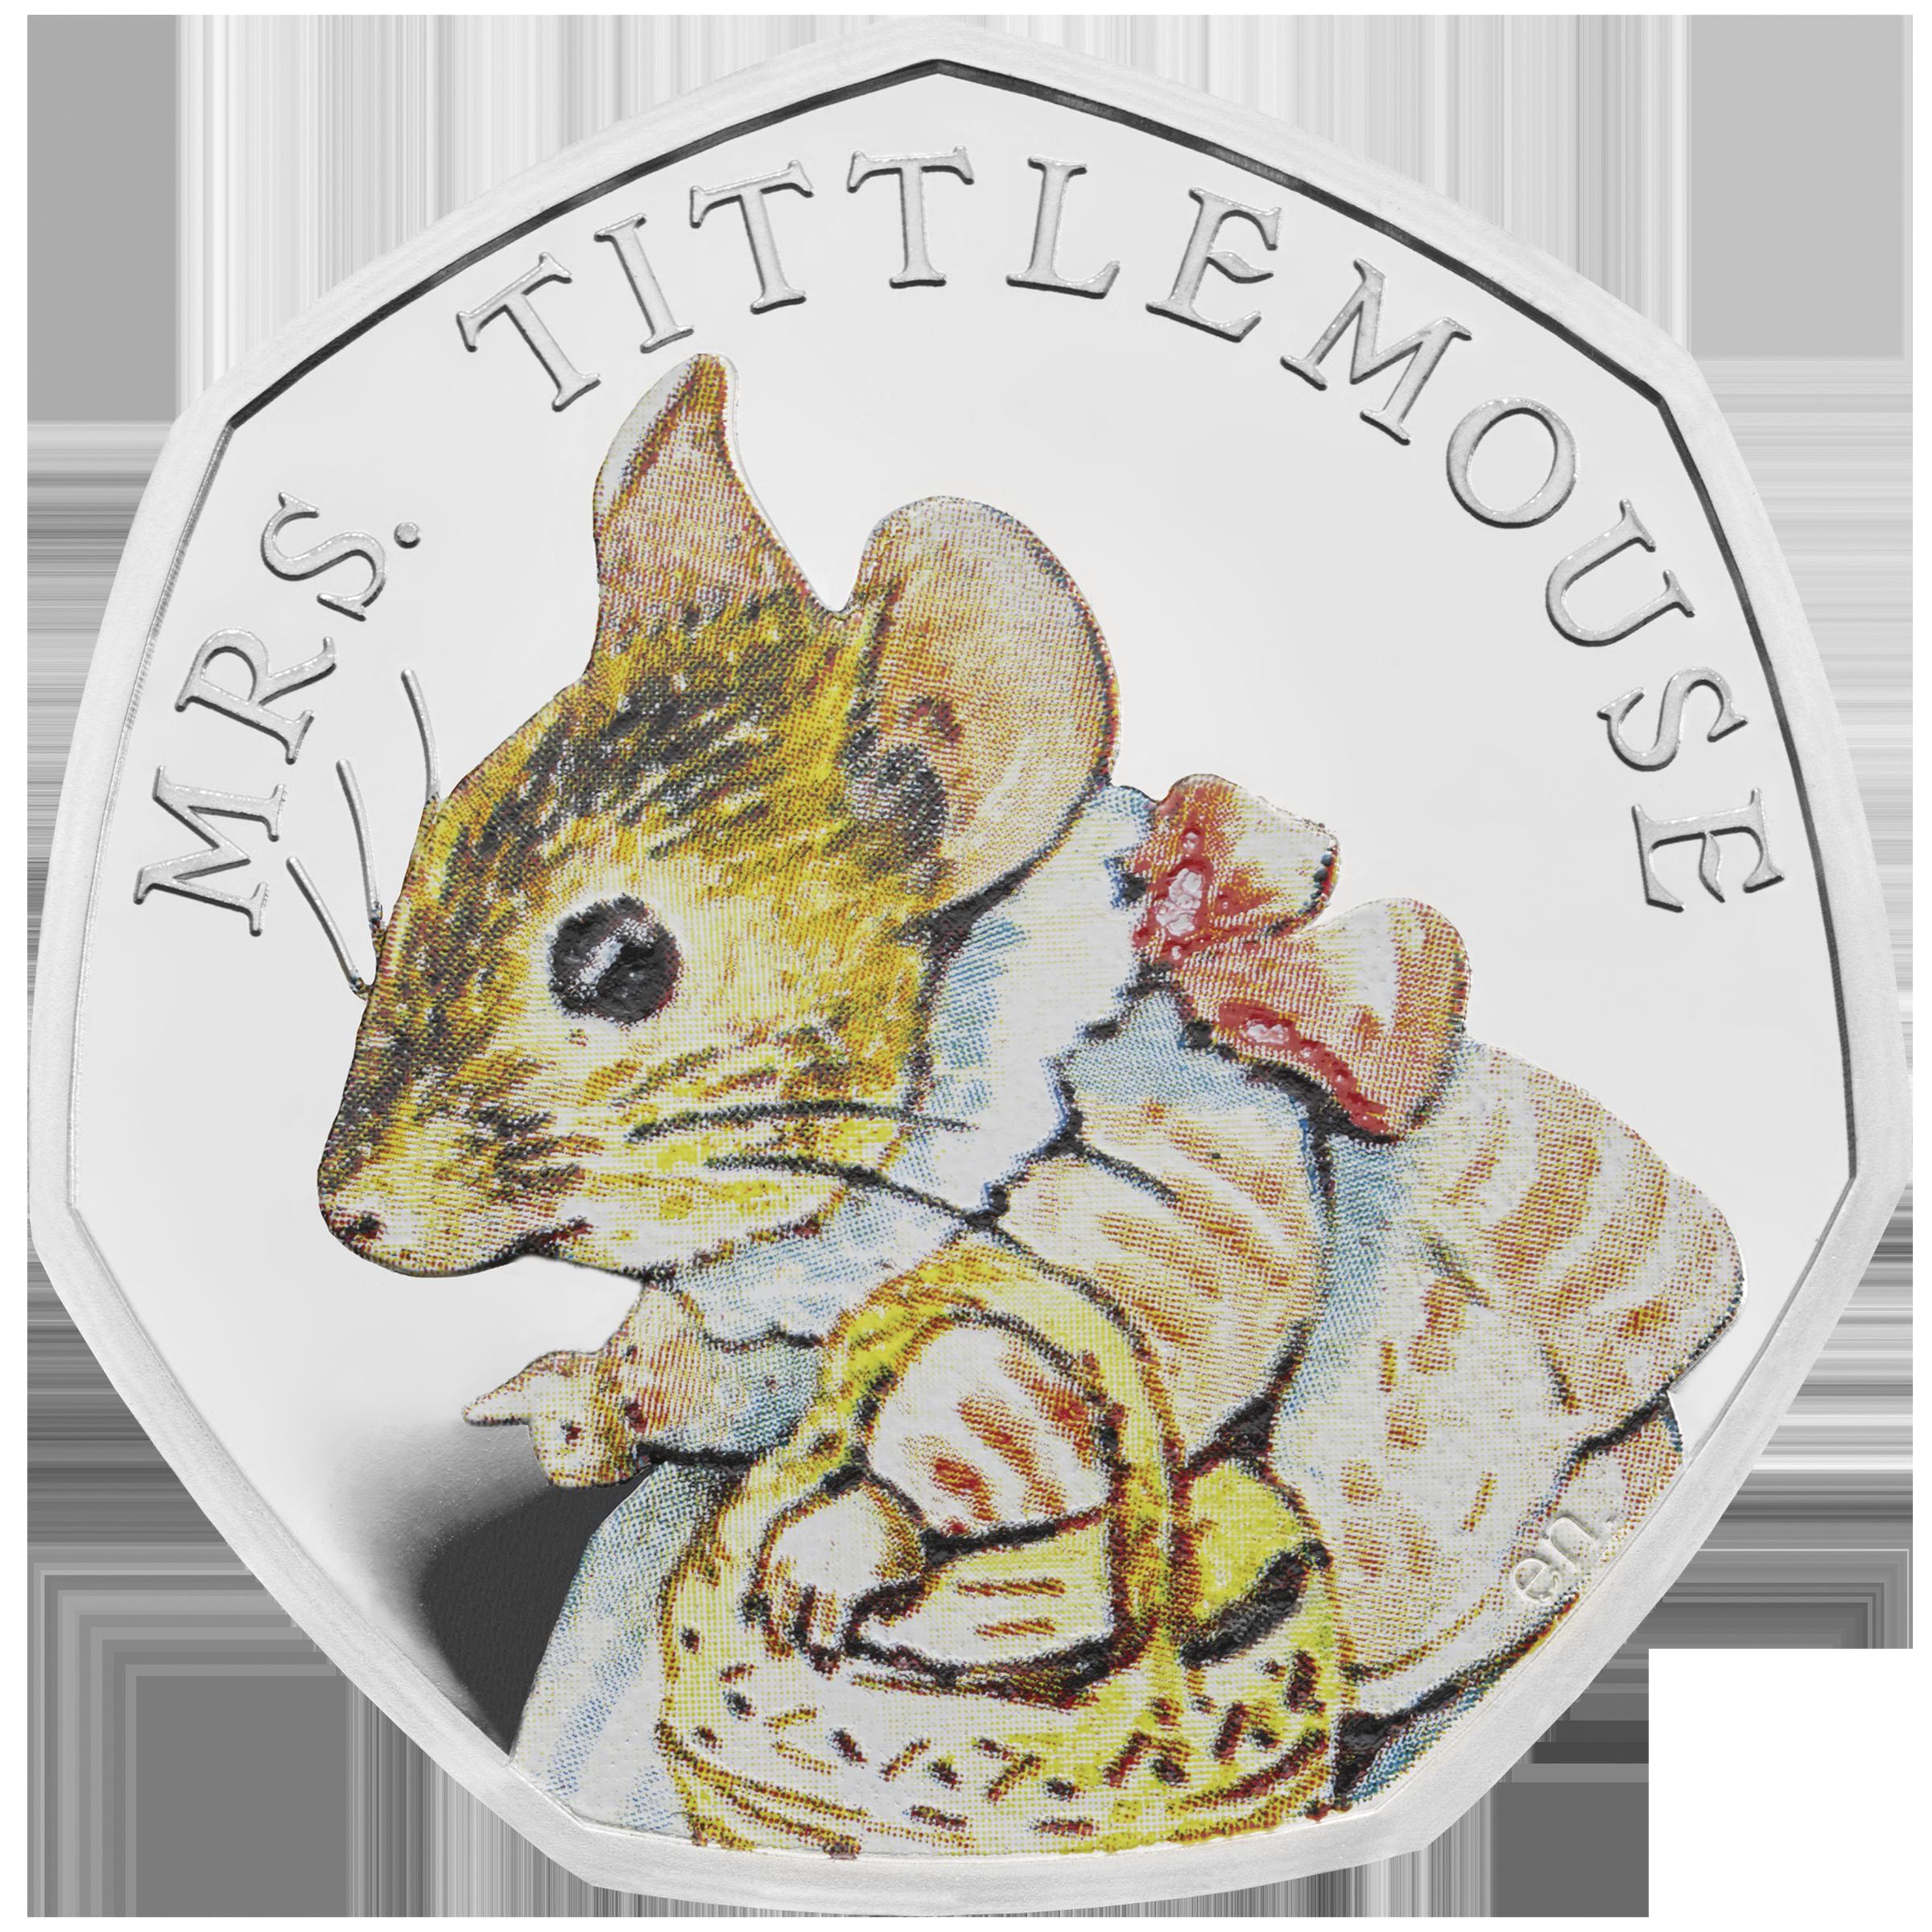 Mrs. Tittlemouse 2018 UK 50p Silver Proof Coin rev - ukp82894 2.png